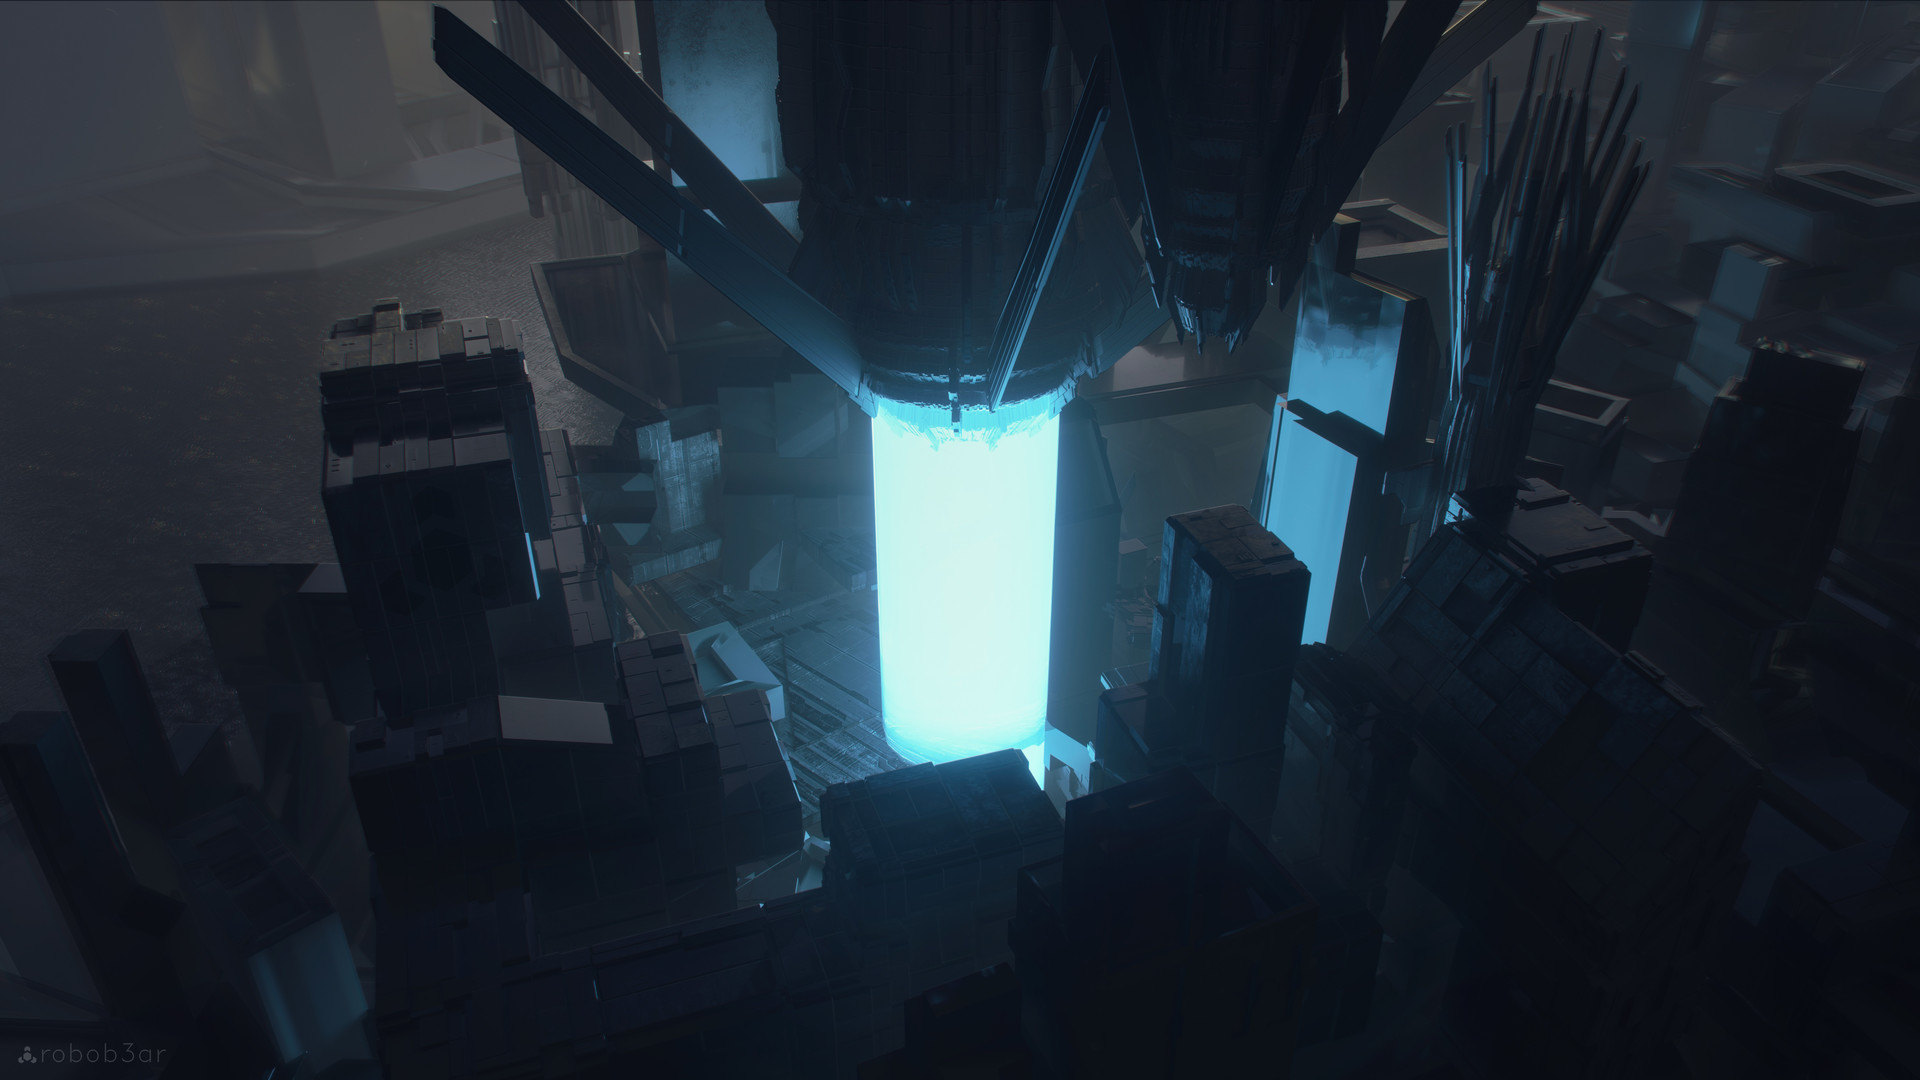 Kresimir jelusic robob3ar 434 211216